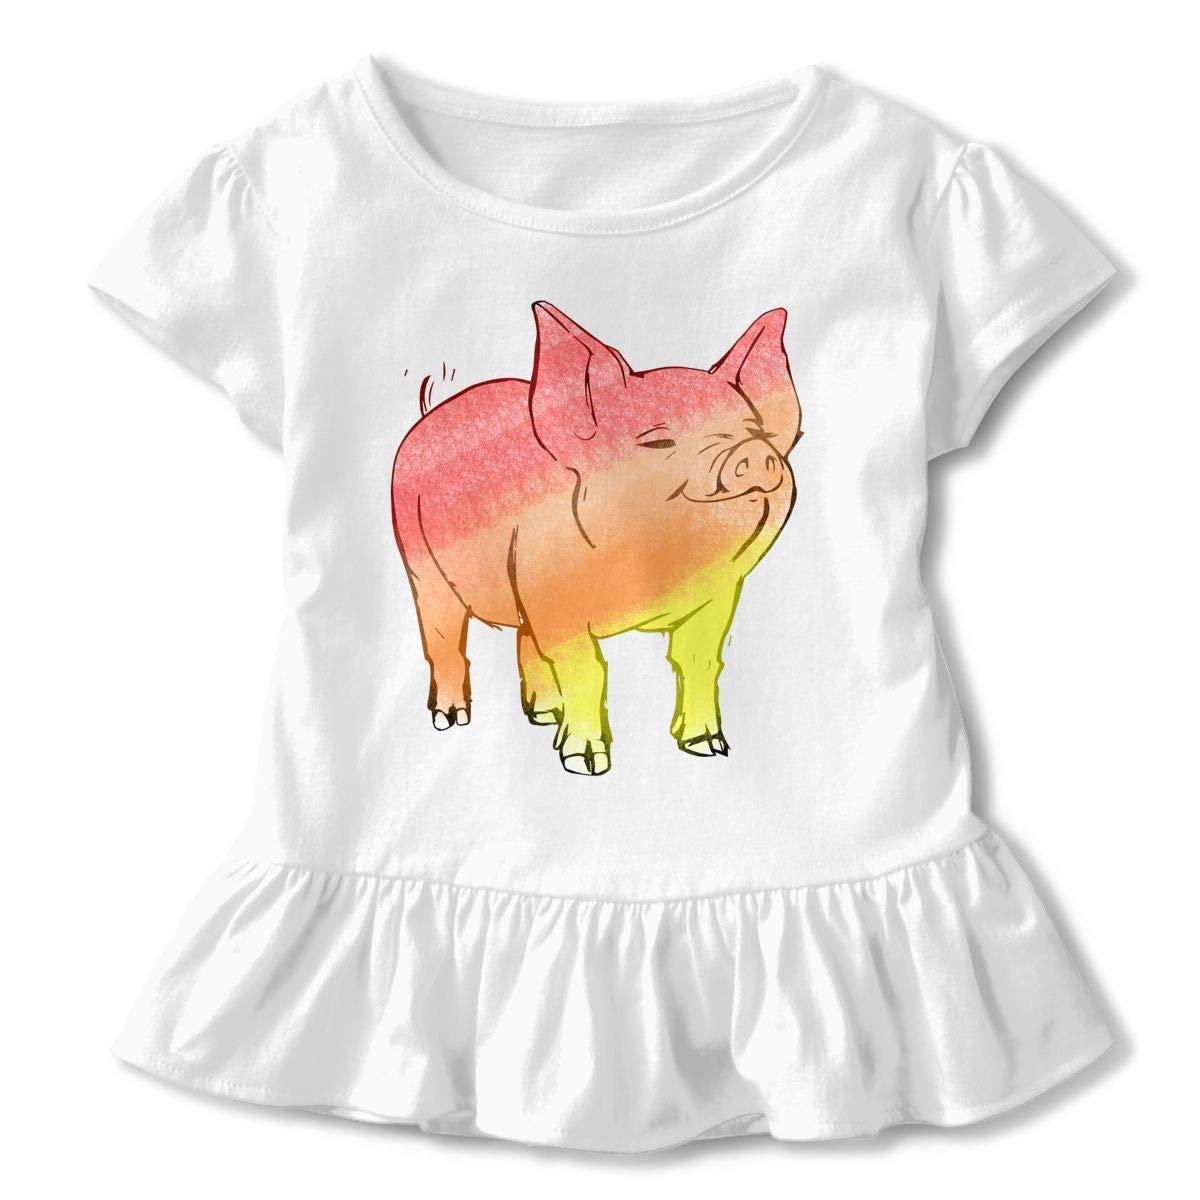 Watercolor Pig Tattoos Toddler Baby Girls Short Sleeve Ruffle T-Shirt